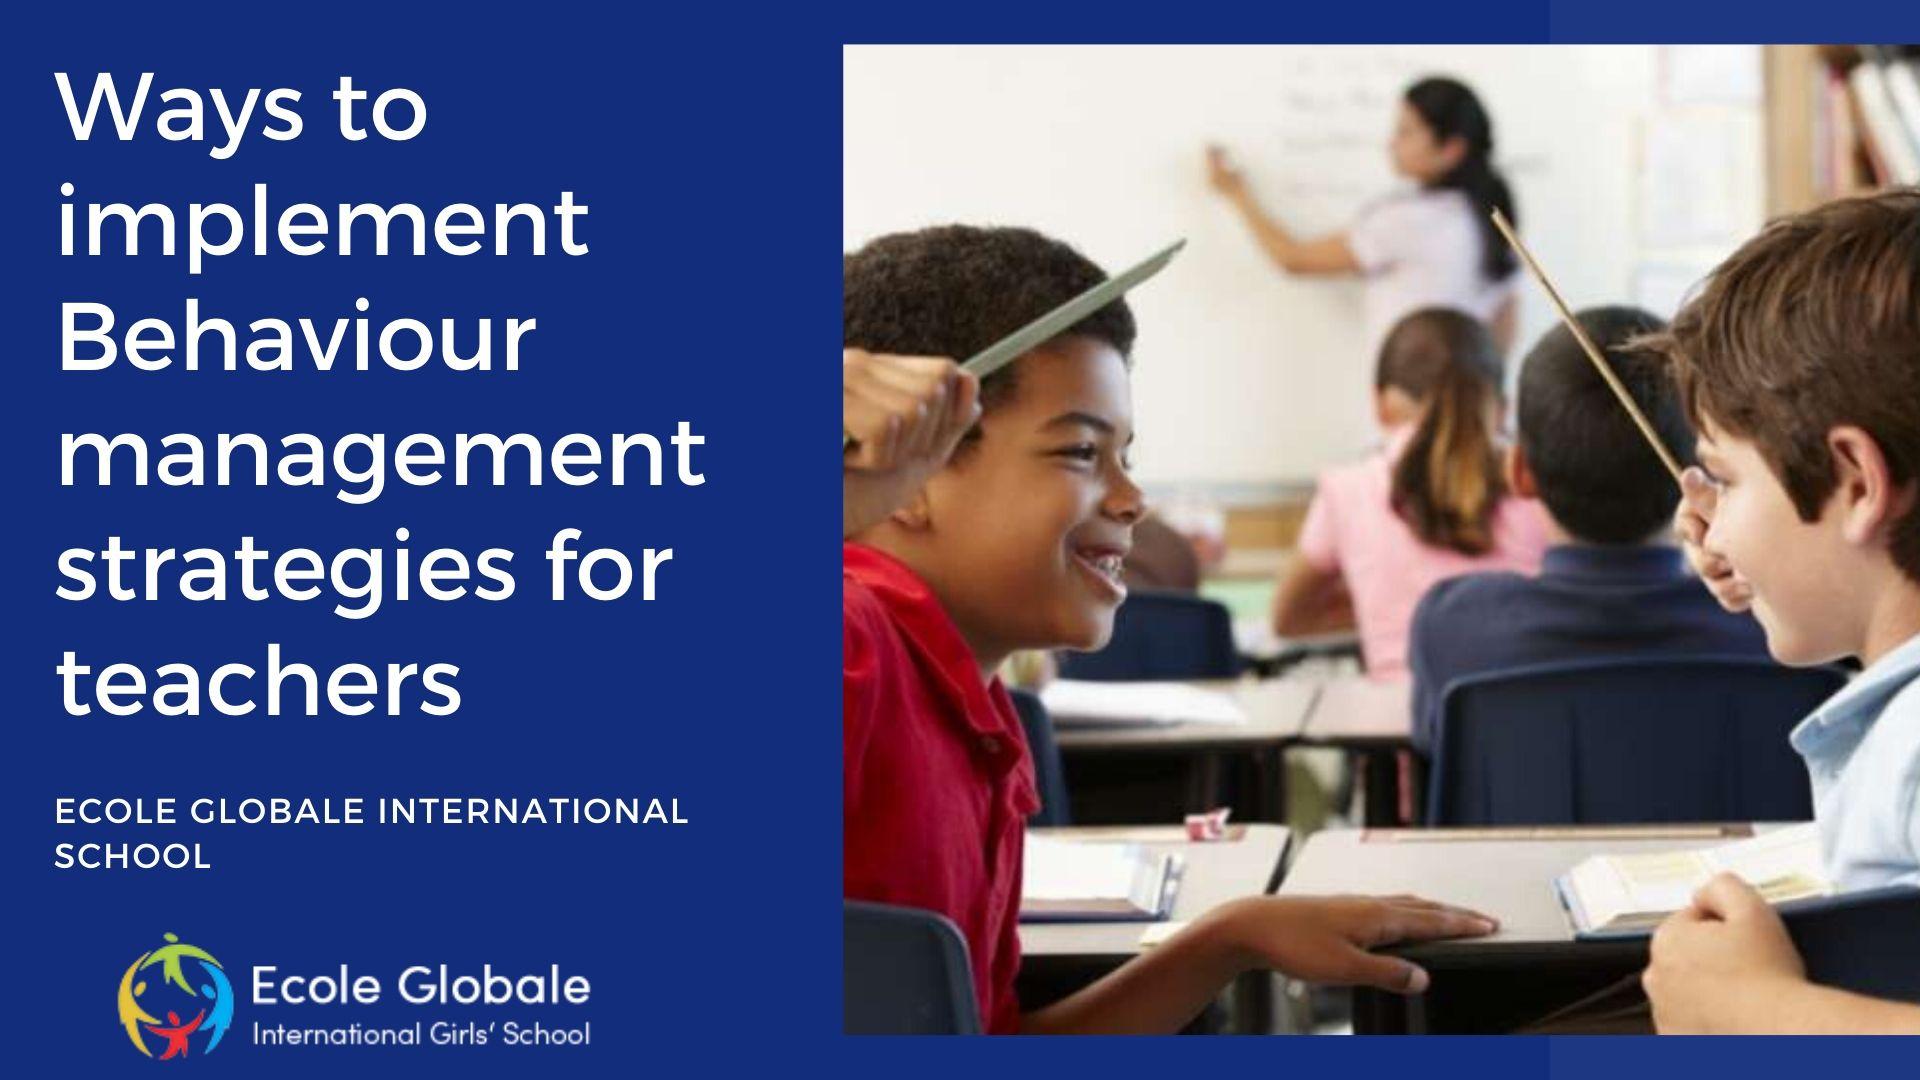 Ways to implement Behavior management strategies for teachers